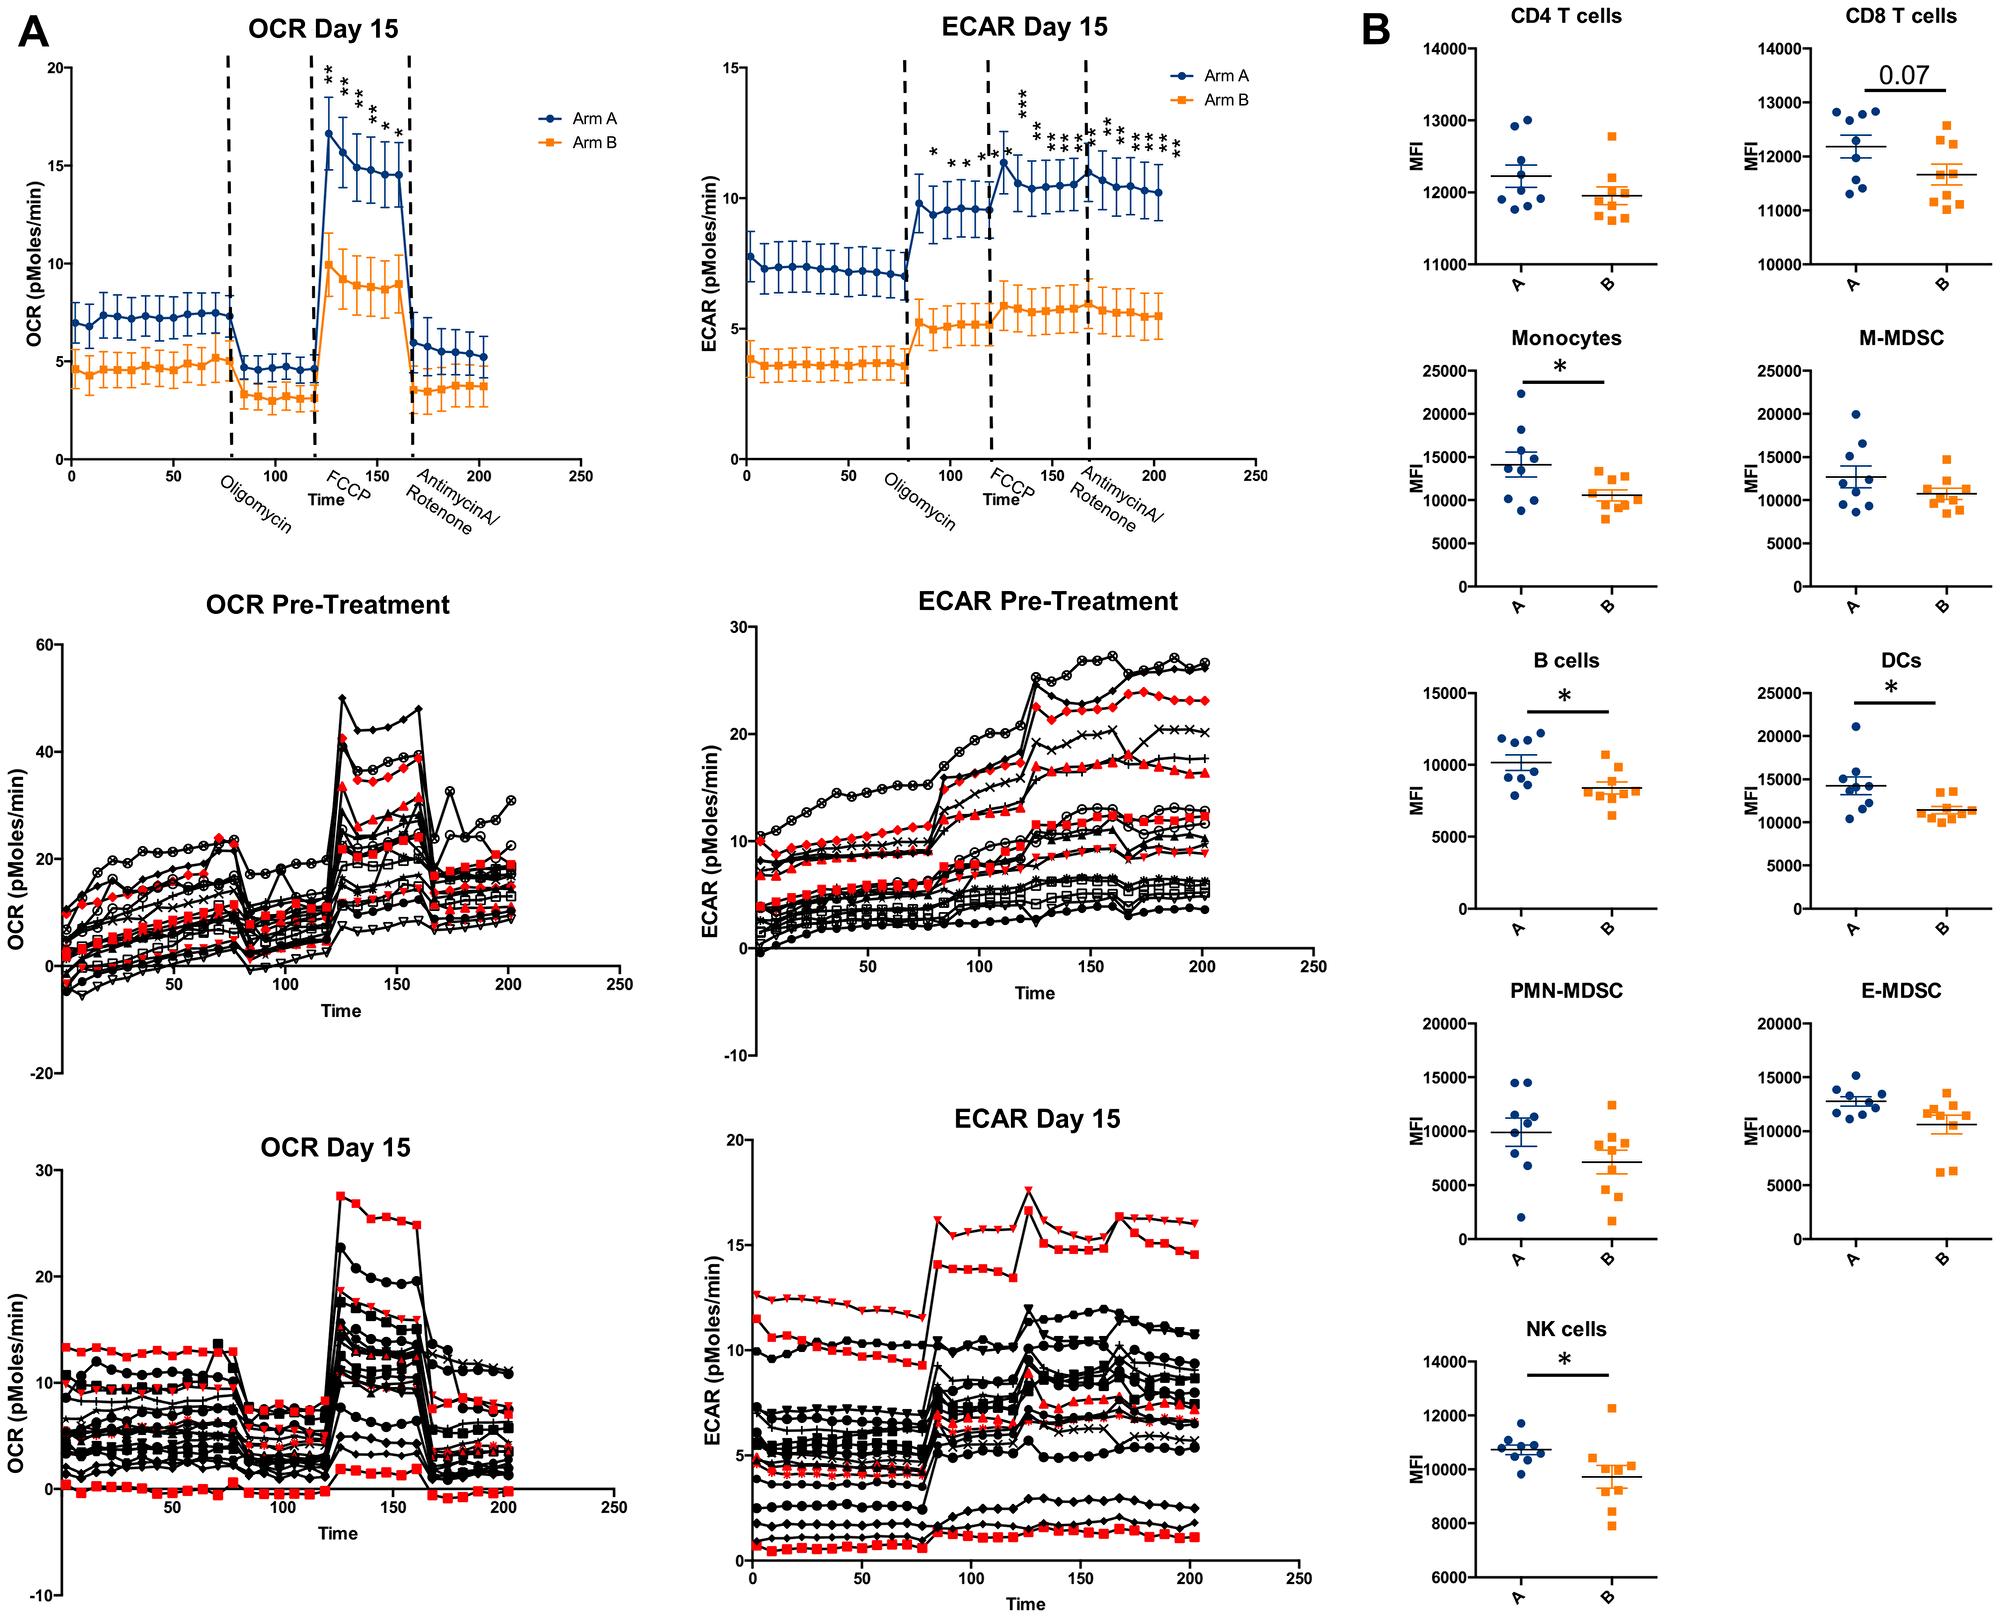 Metabolic analysis of PBMCs.